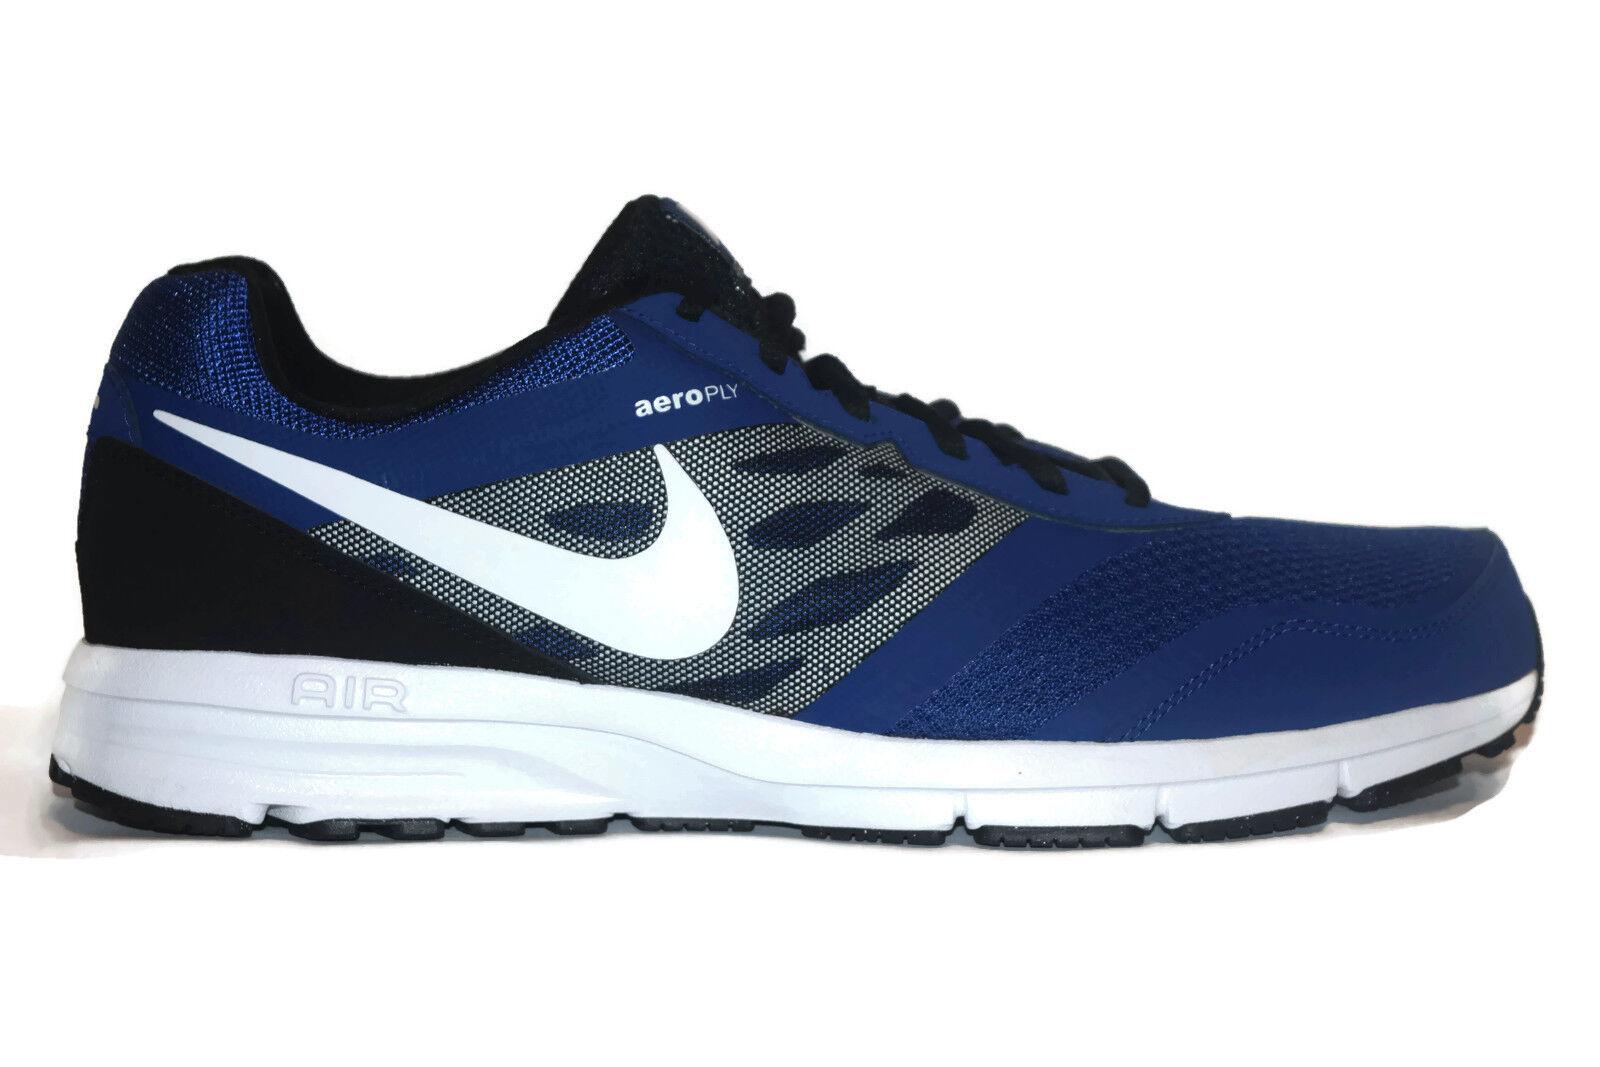 Men's Nike Air Relentless 4 Running Shoes, 685138 404 Size 14 DRoyal Blue/